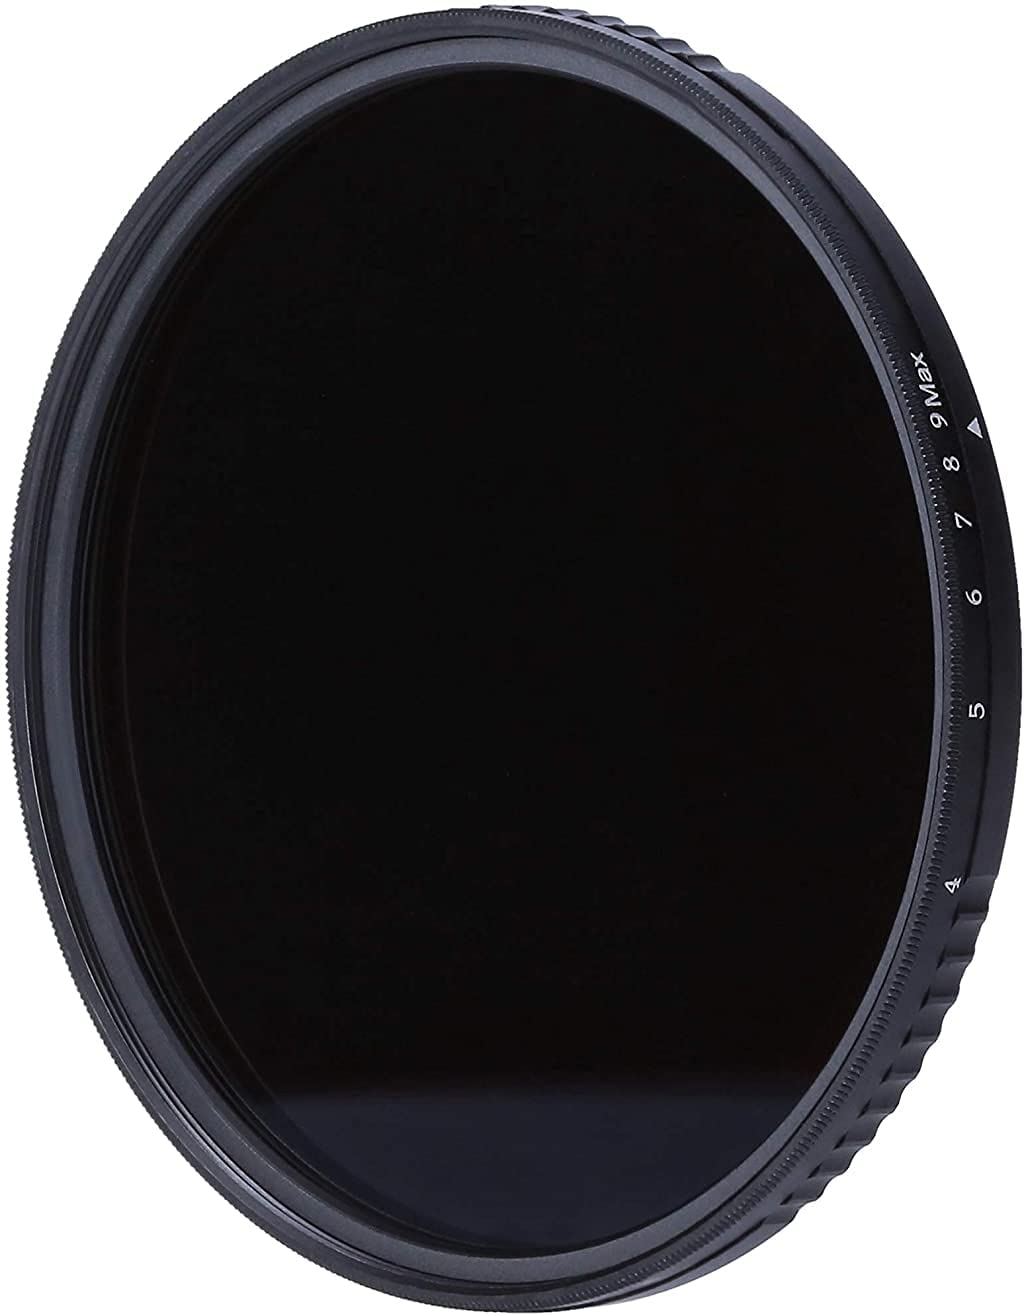 Rollei F:X Pro ND8-512 72mm